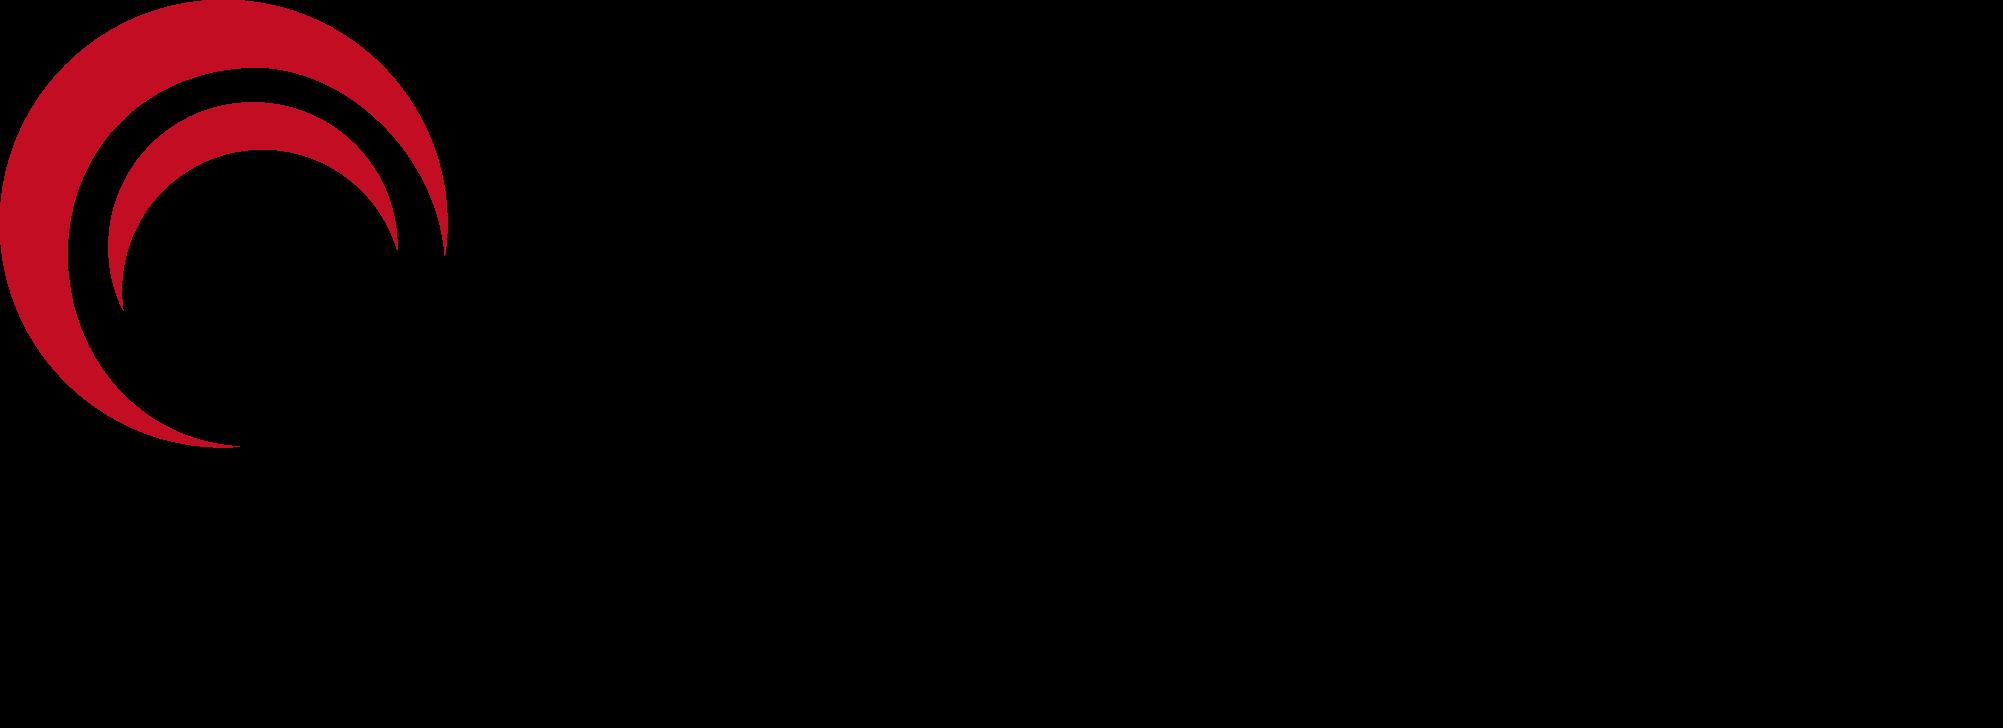 HD Episonica